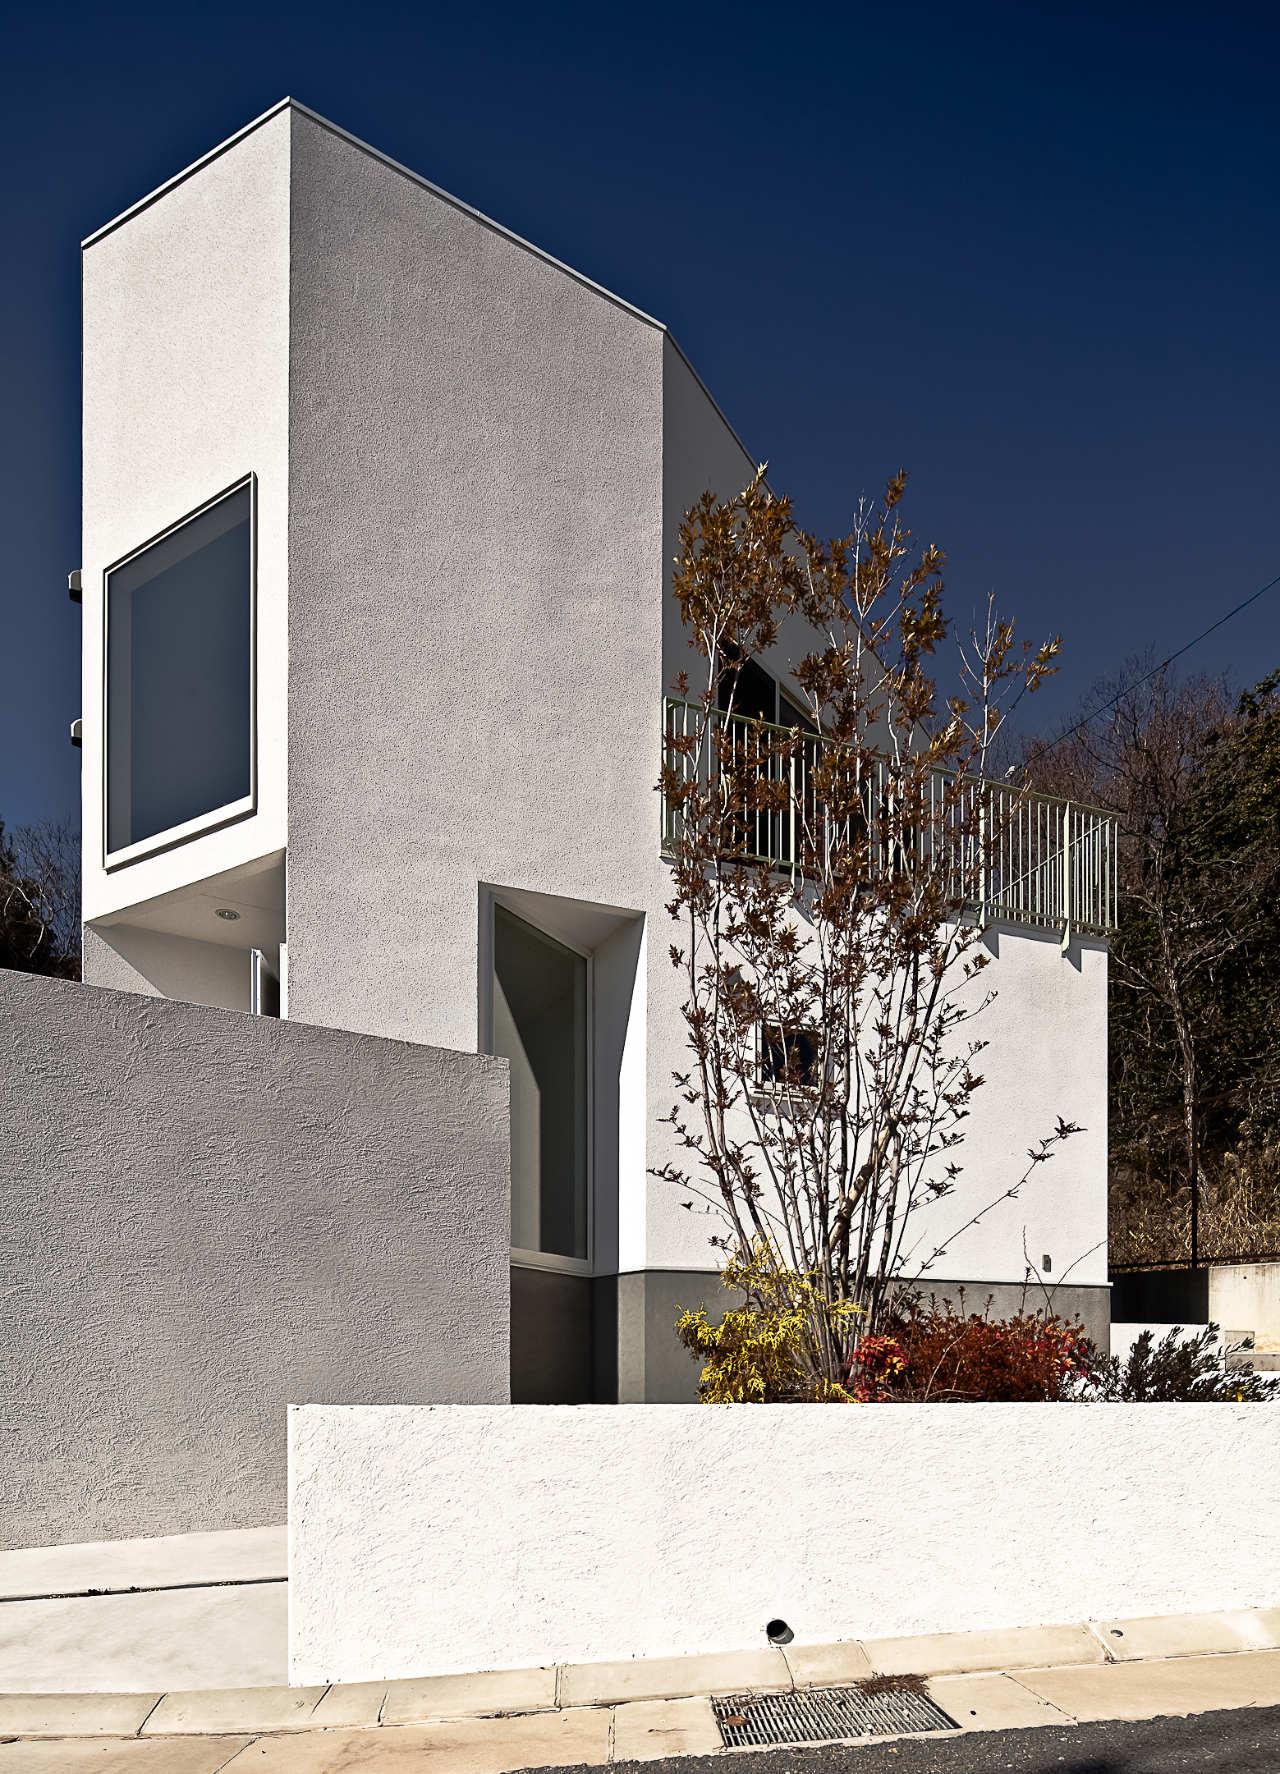 Nomura 24 House / Antonino Cardillo architect, © Antonino Cardillo